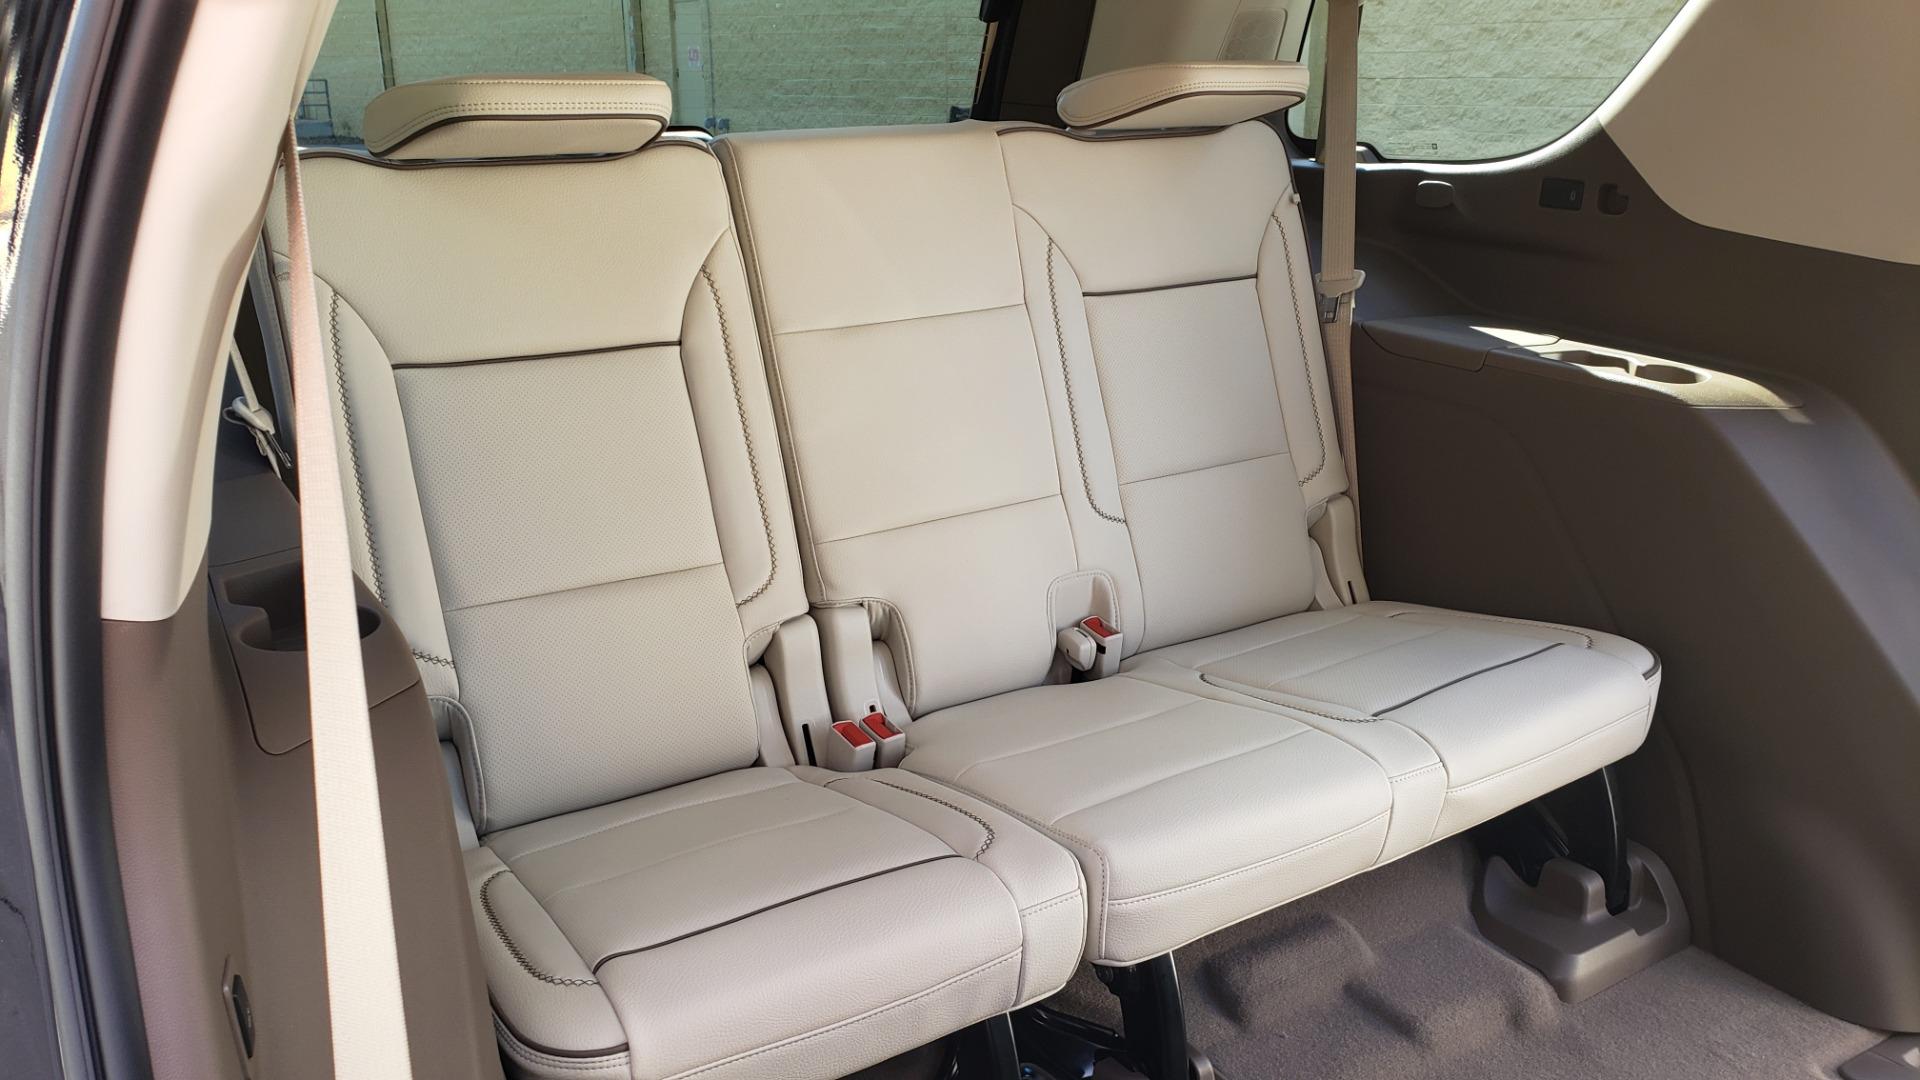 Used 2021 GMC YUKON DENALI PREMIUM 4WD / NAV / ADVANCED TECH / ENTERTAINMENT for sale Sold at Formula Imports in Charlotte NC 28227 78